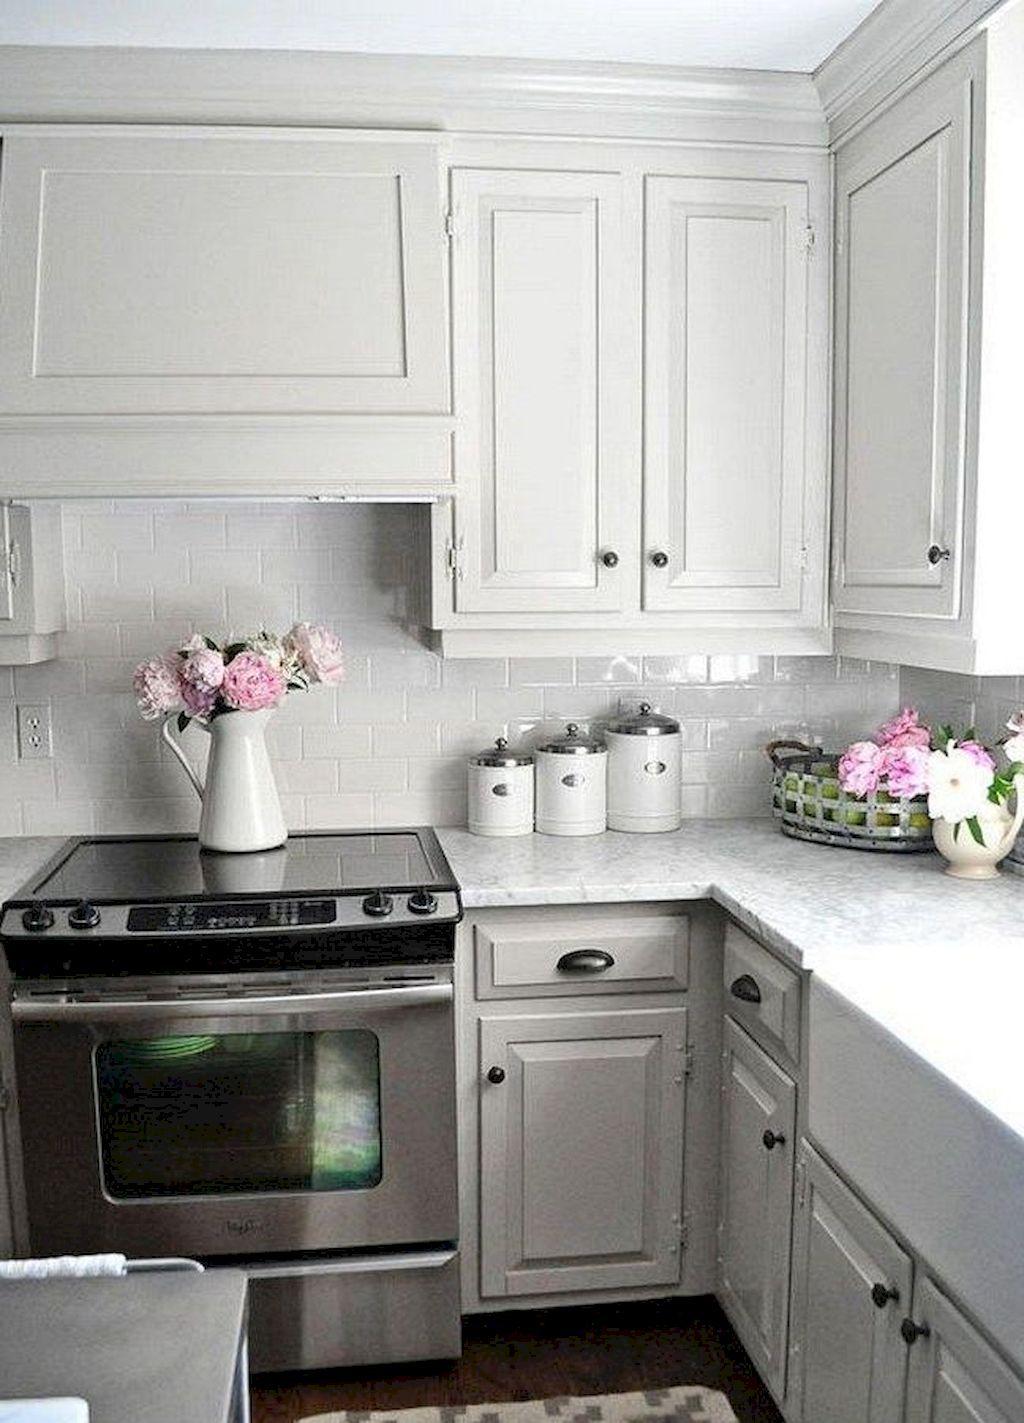 01 Incredible Farmhouse Gray Kitchen Cabinet Design Ideas Kitchen Cabinets Decor Light Grey Kitchens Kitchen Cabinets Makeover